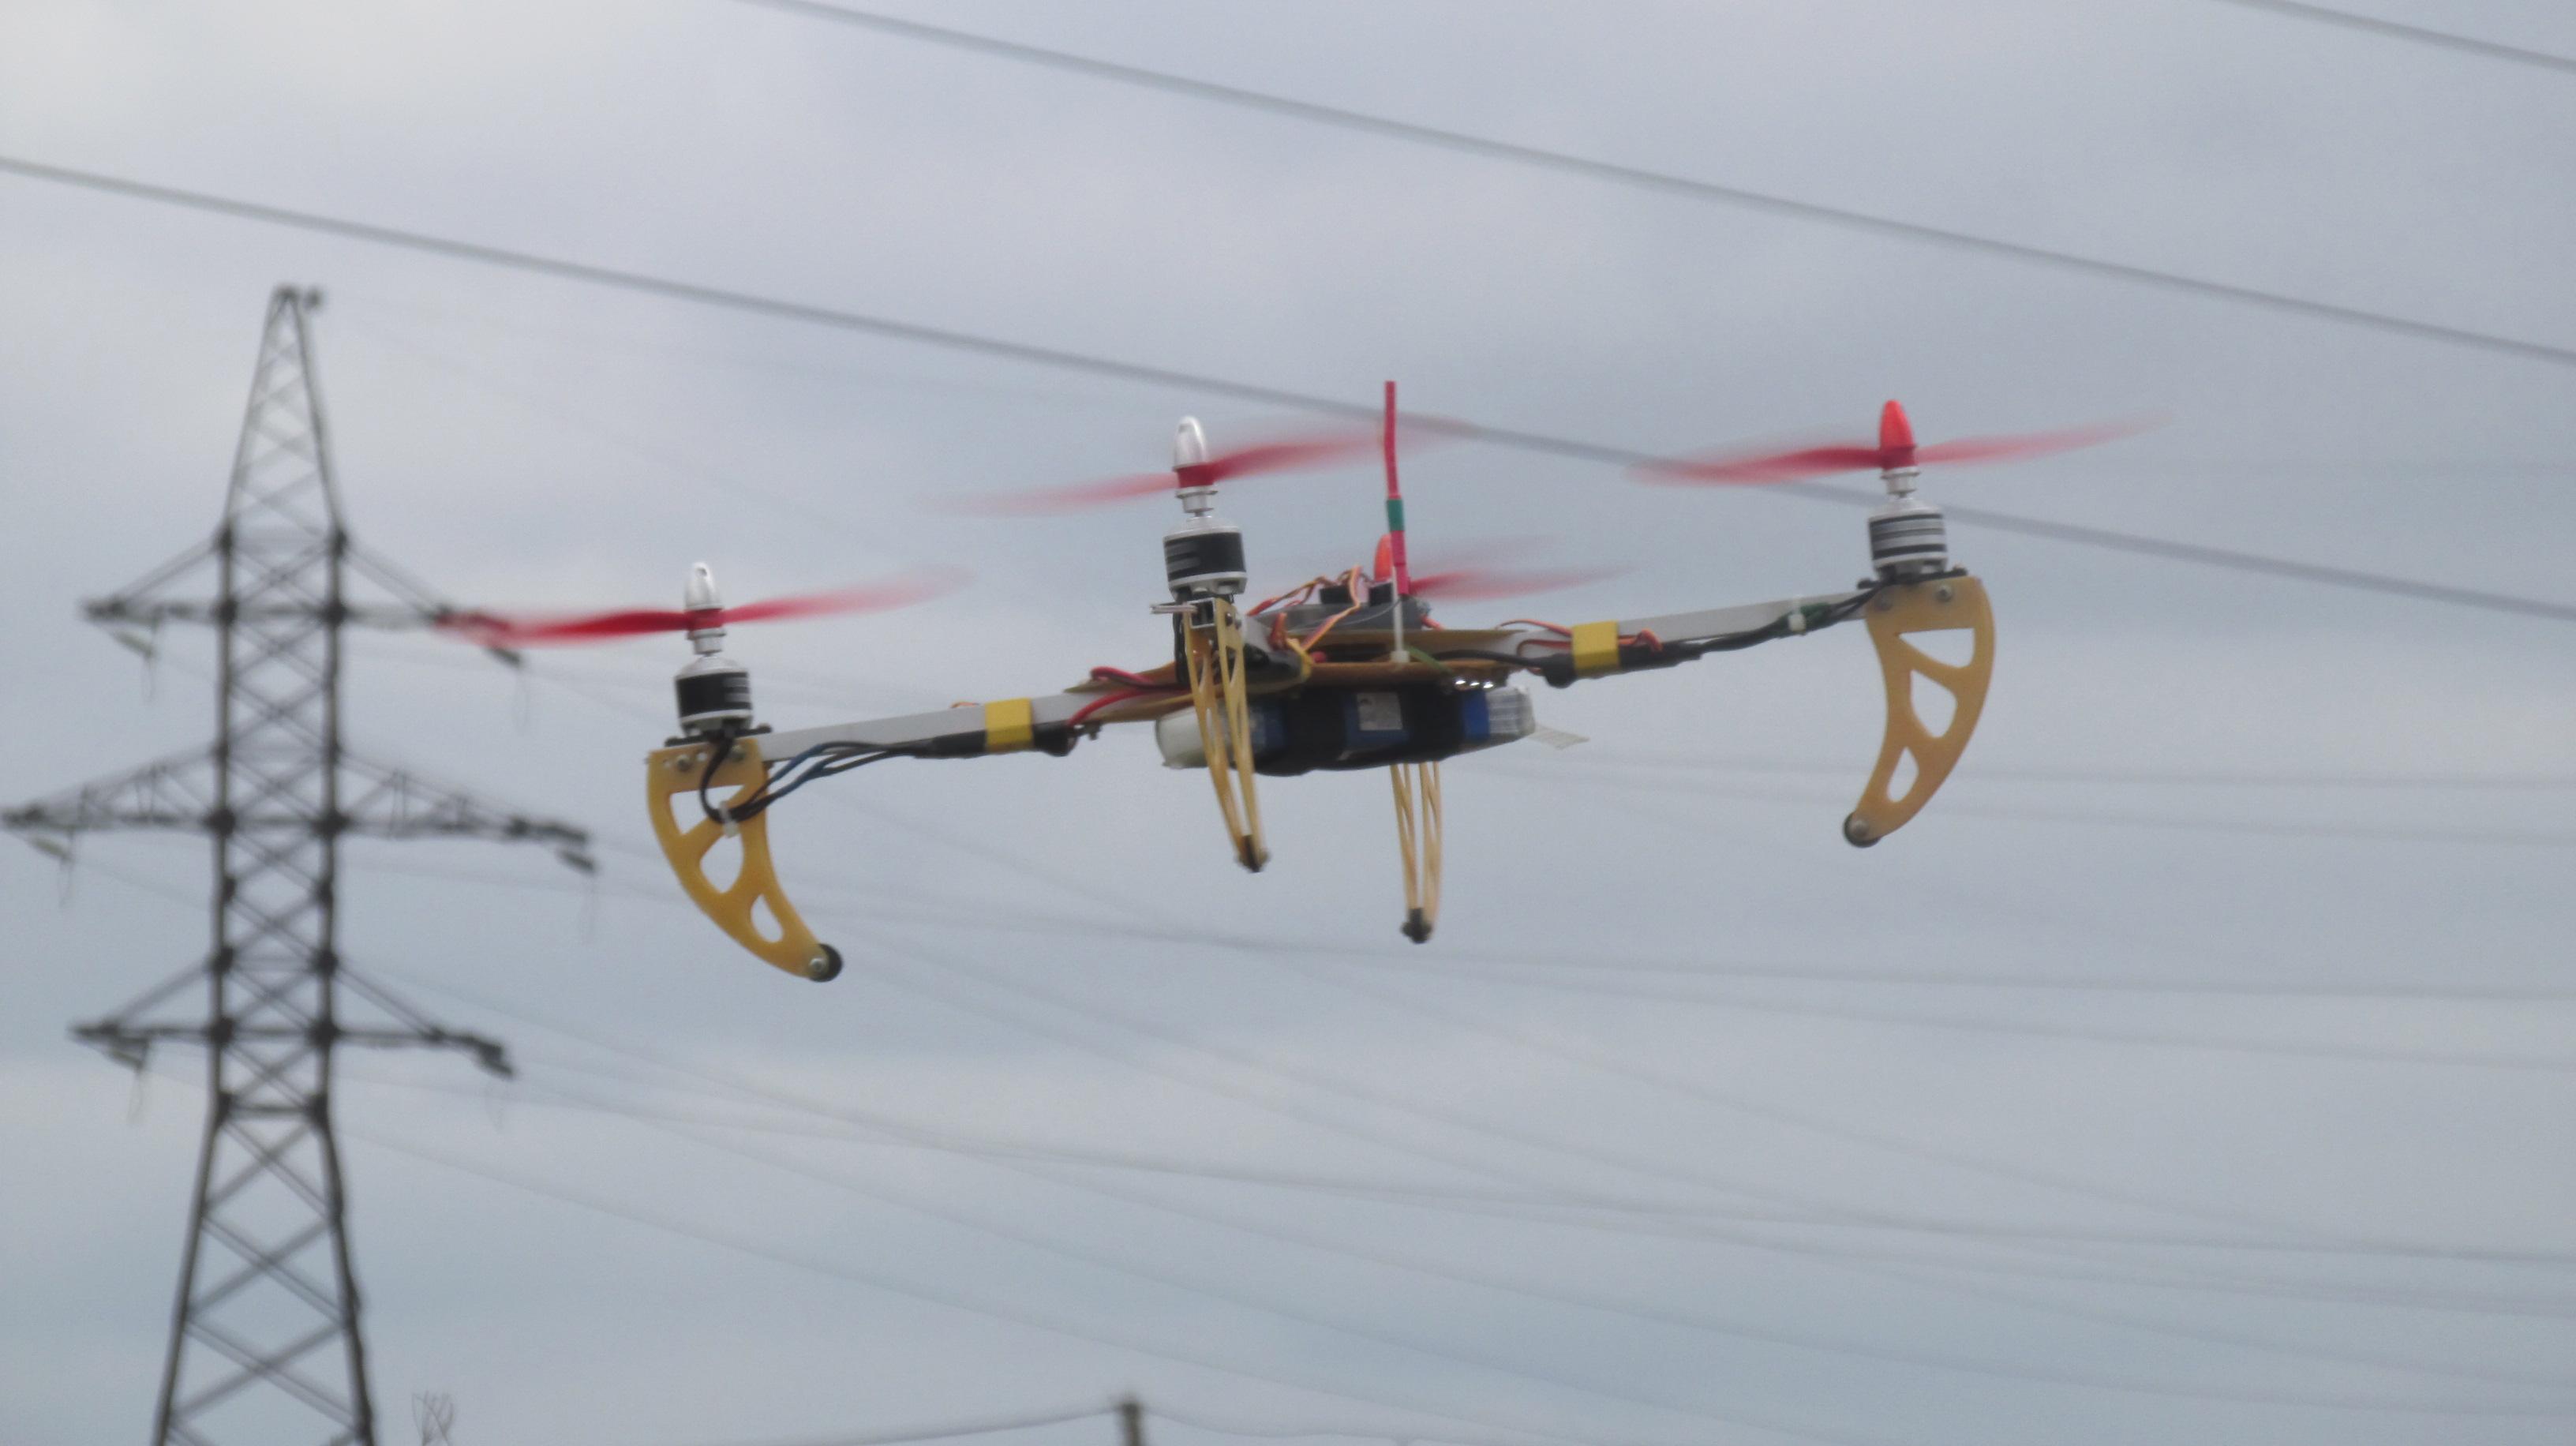 Квадрокоптеров с камерой своими руками фото 373